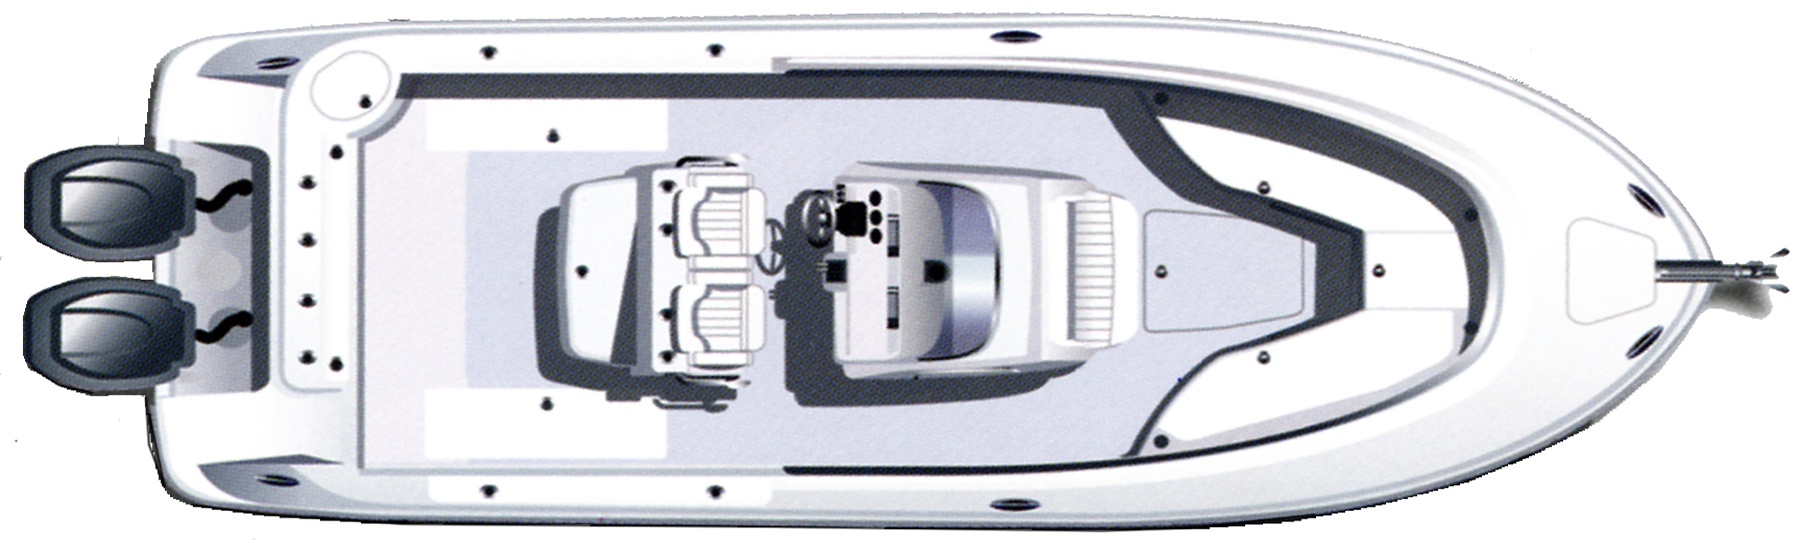 R300 Center Console Floor Plan 1